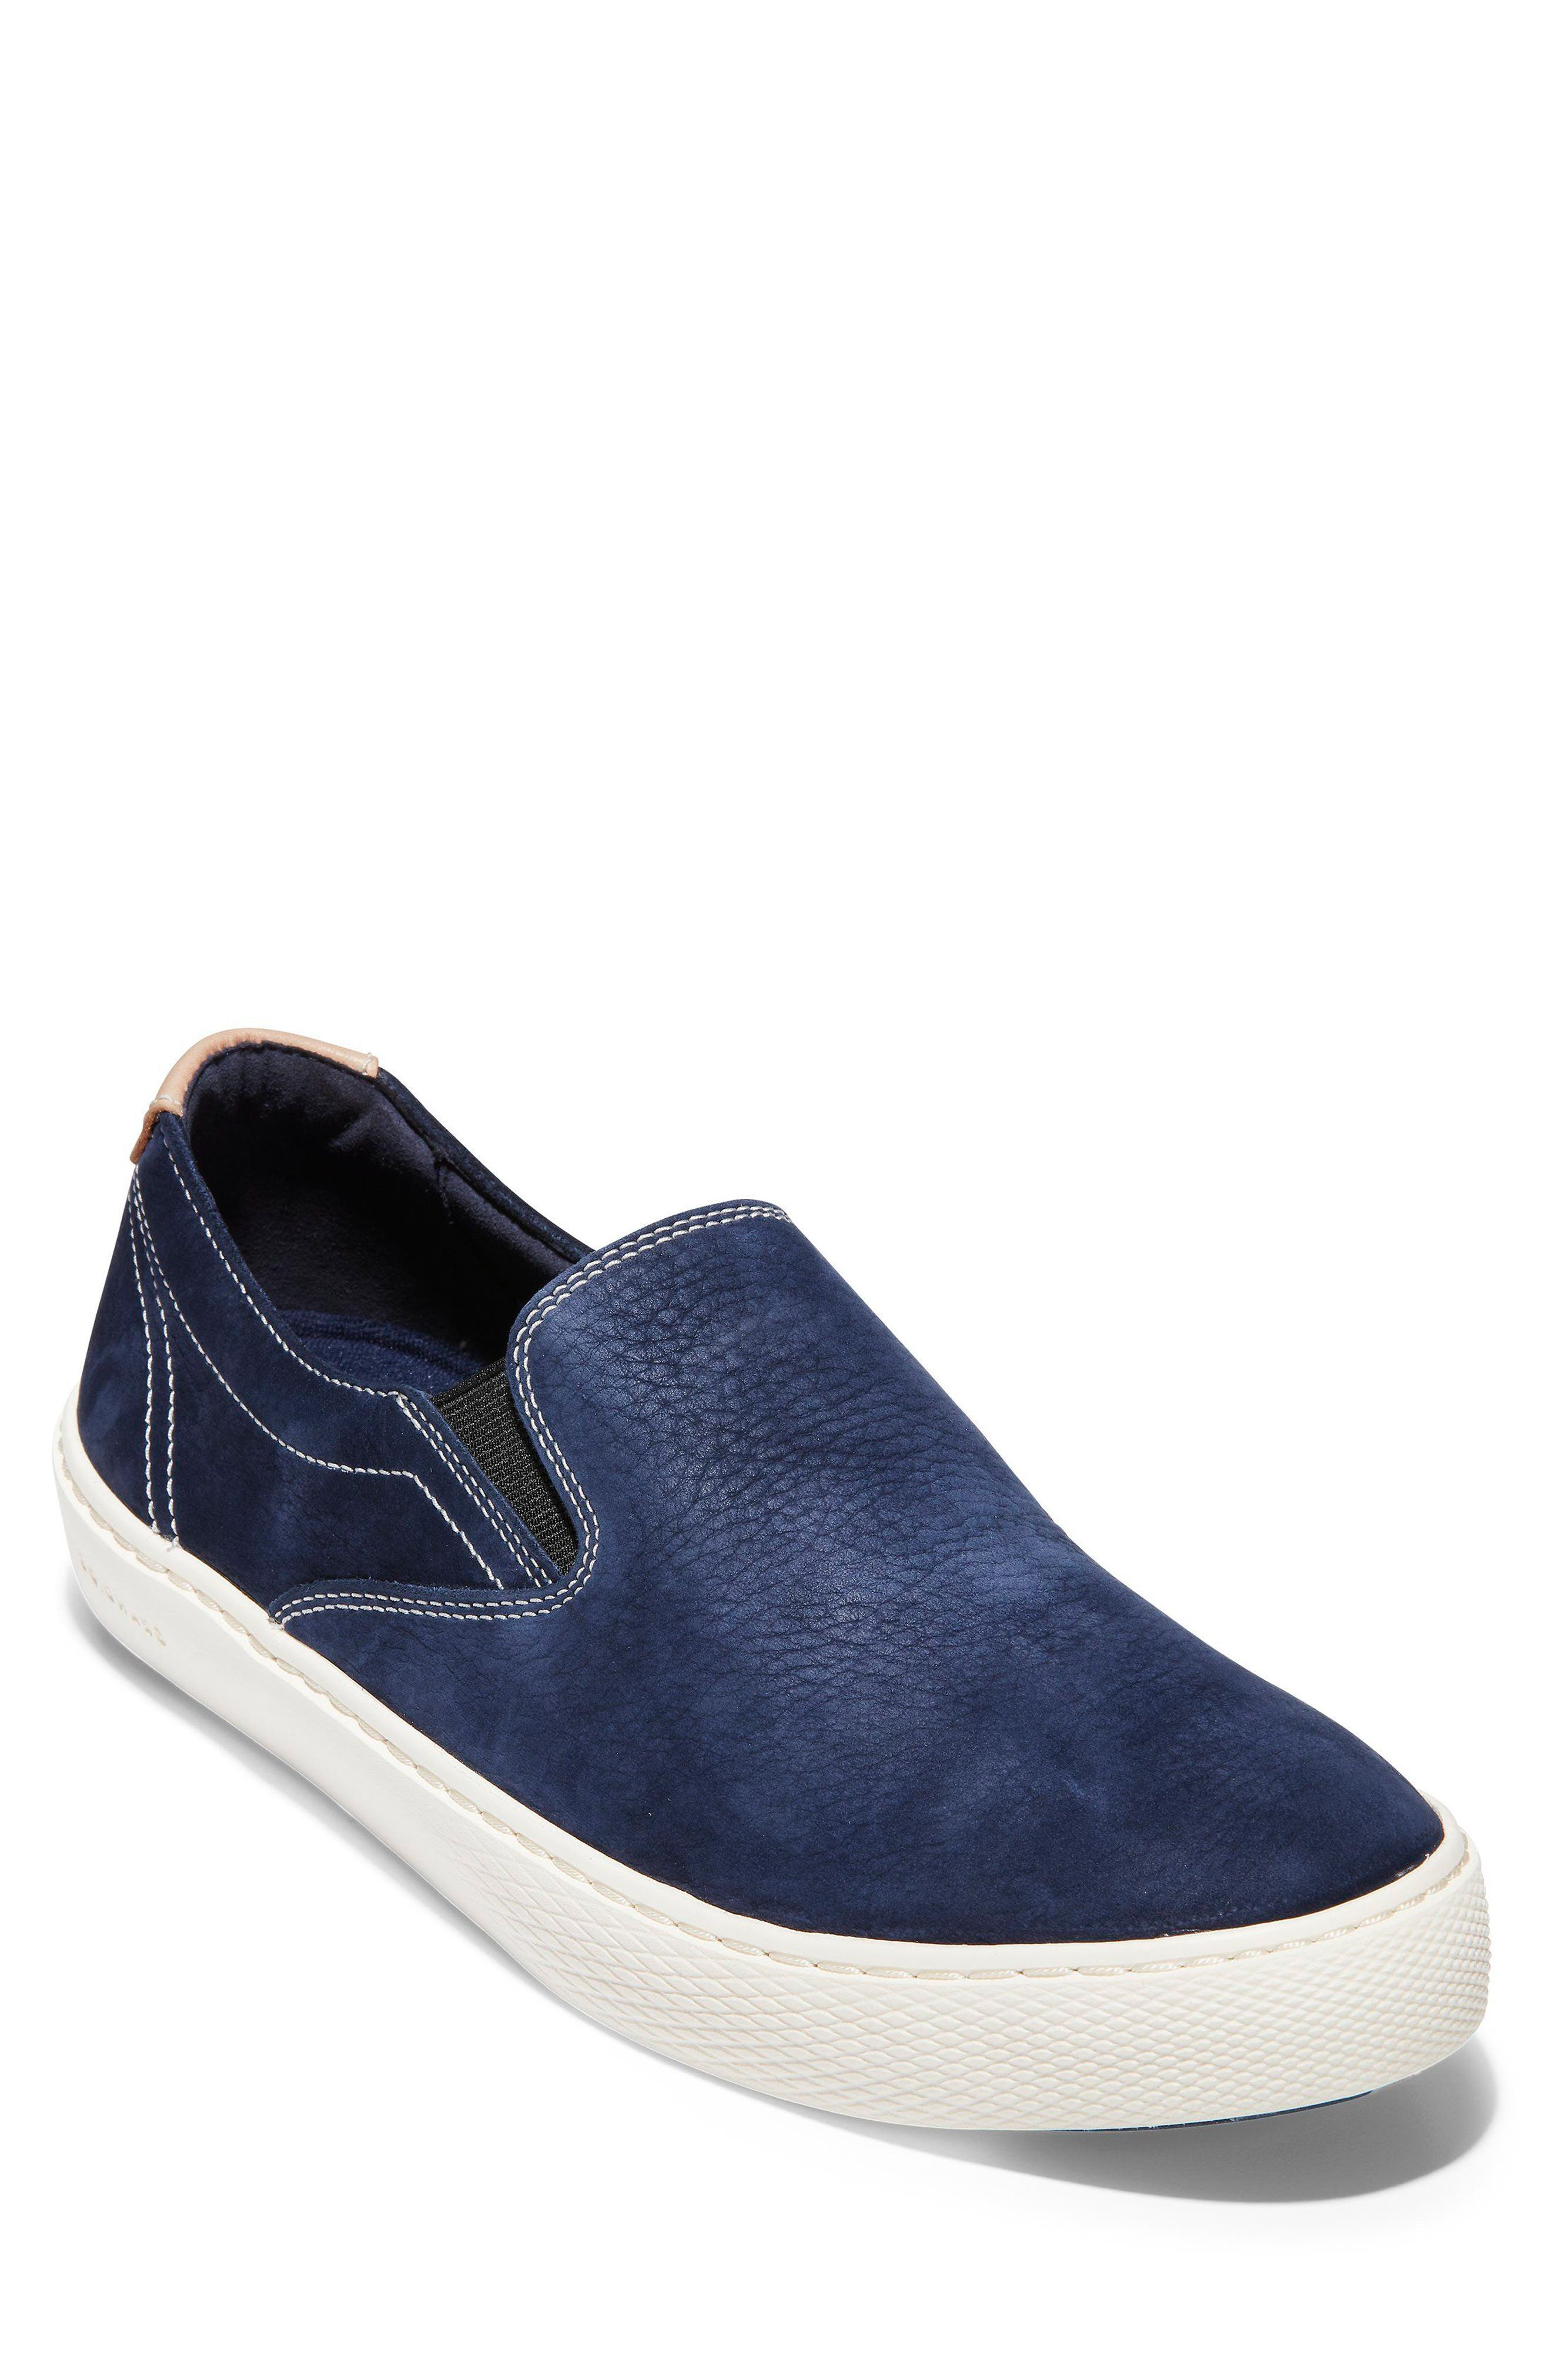 GrandPrø Deck Slip-On Sneaker,                         Main,                         color, Marine Blue Nubuck